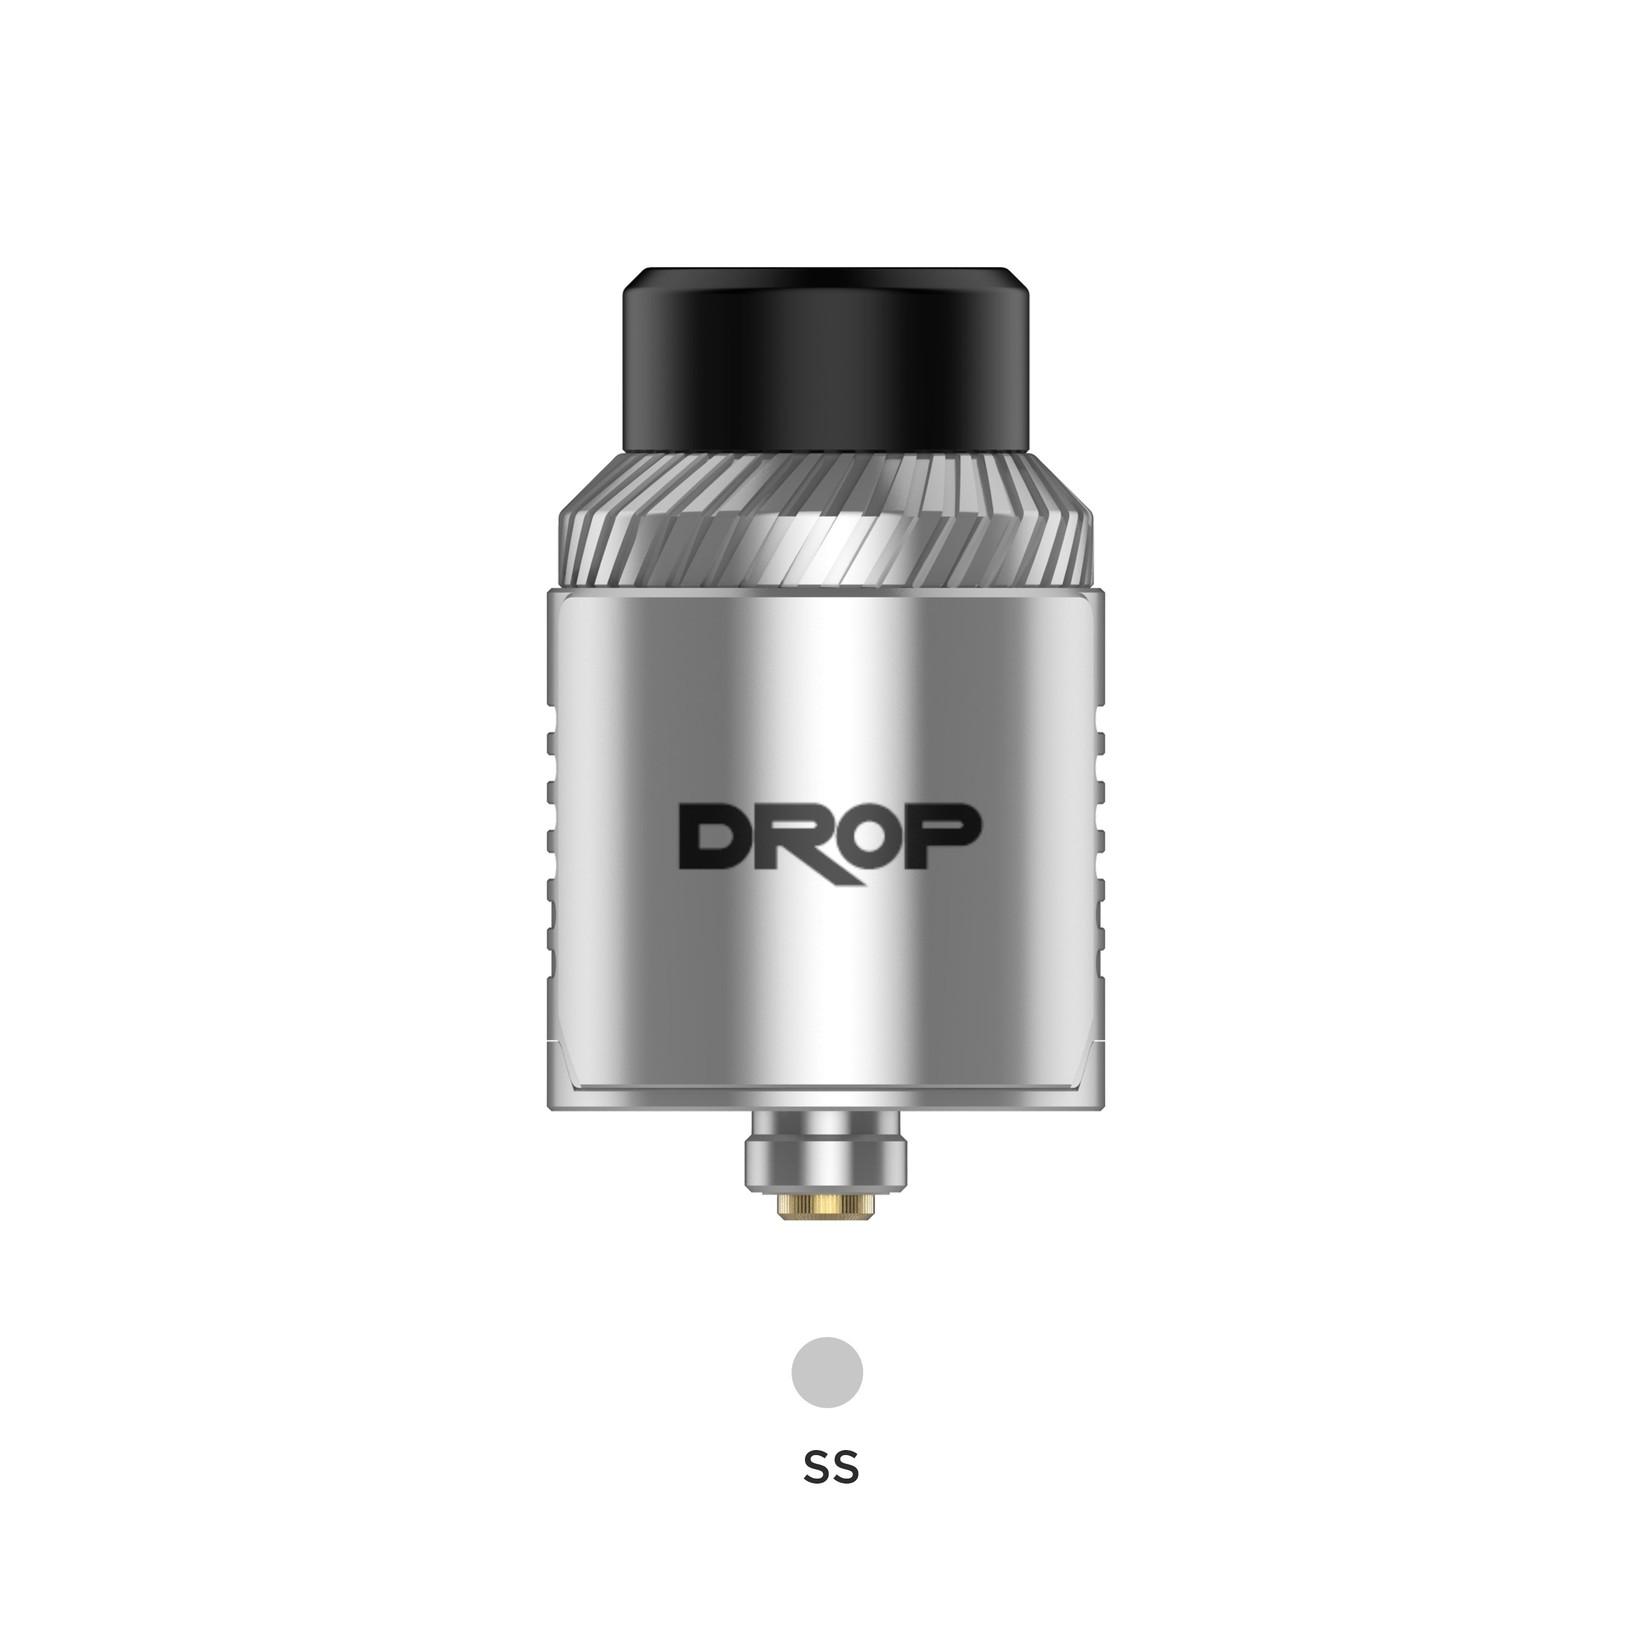 Digiflavor Drop RDA v1.5